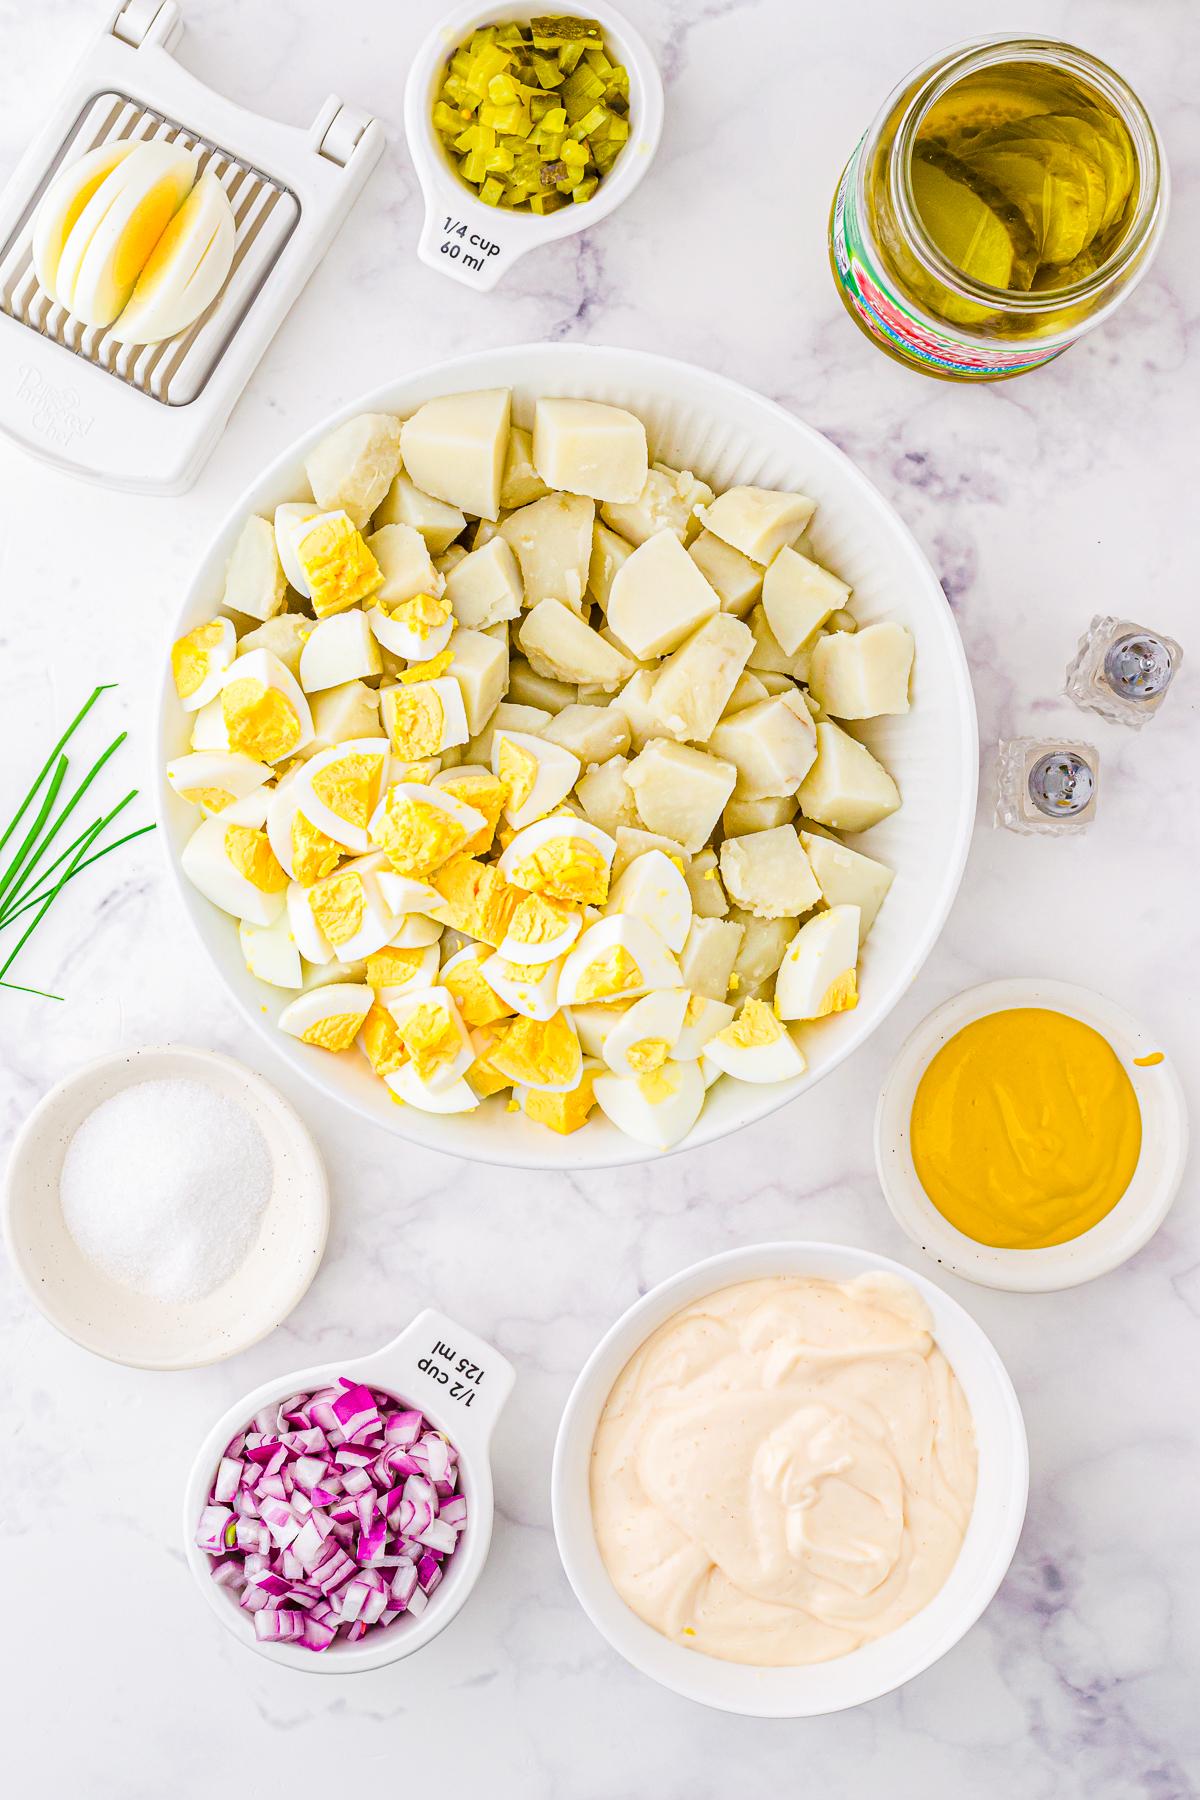 Ingredients needed to make Classic Potato Salad